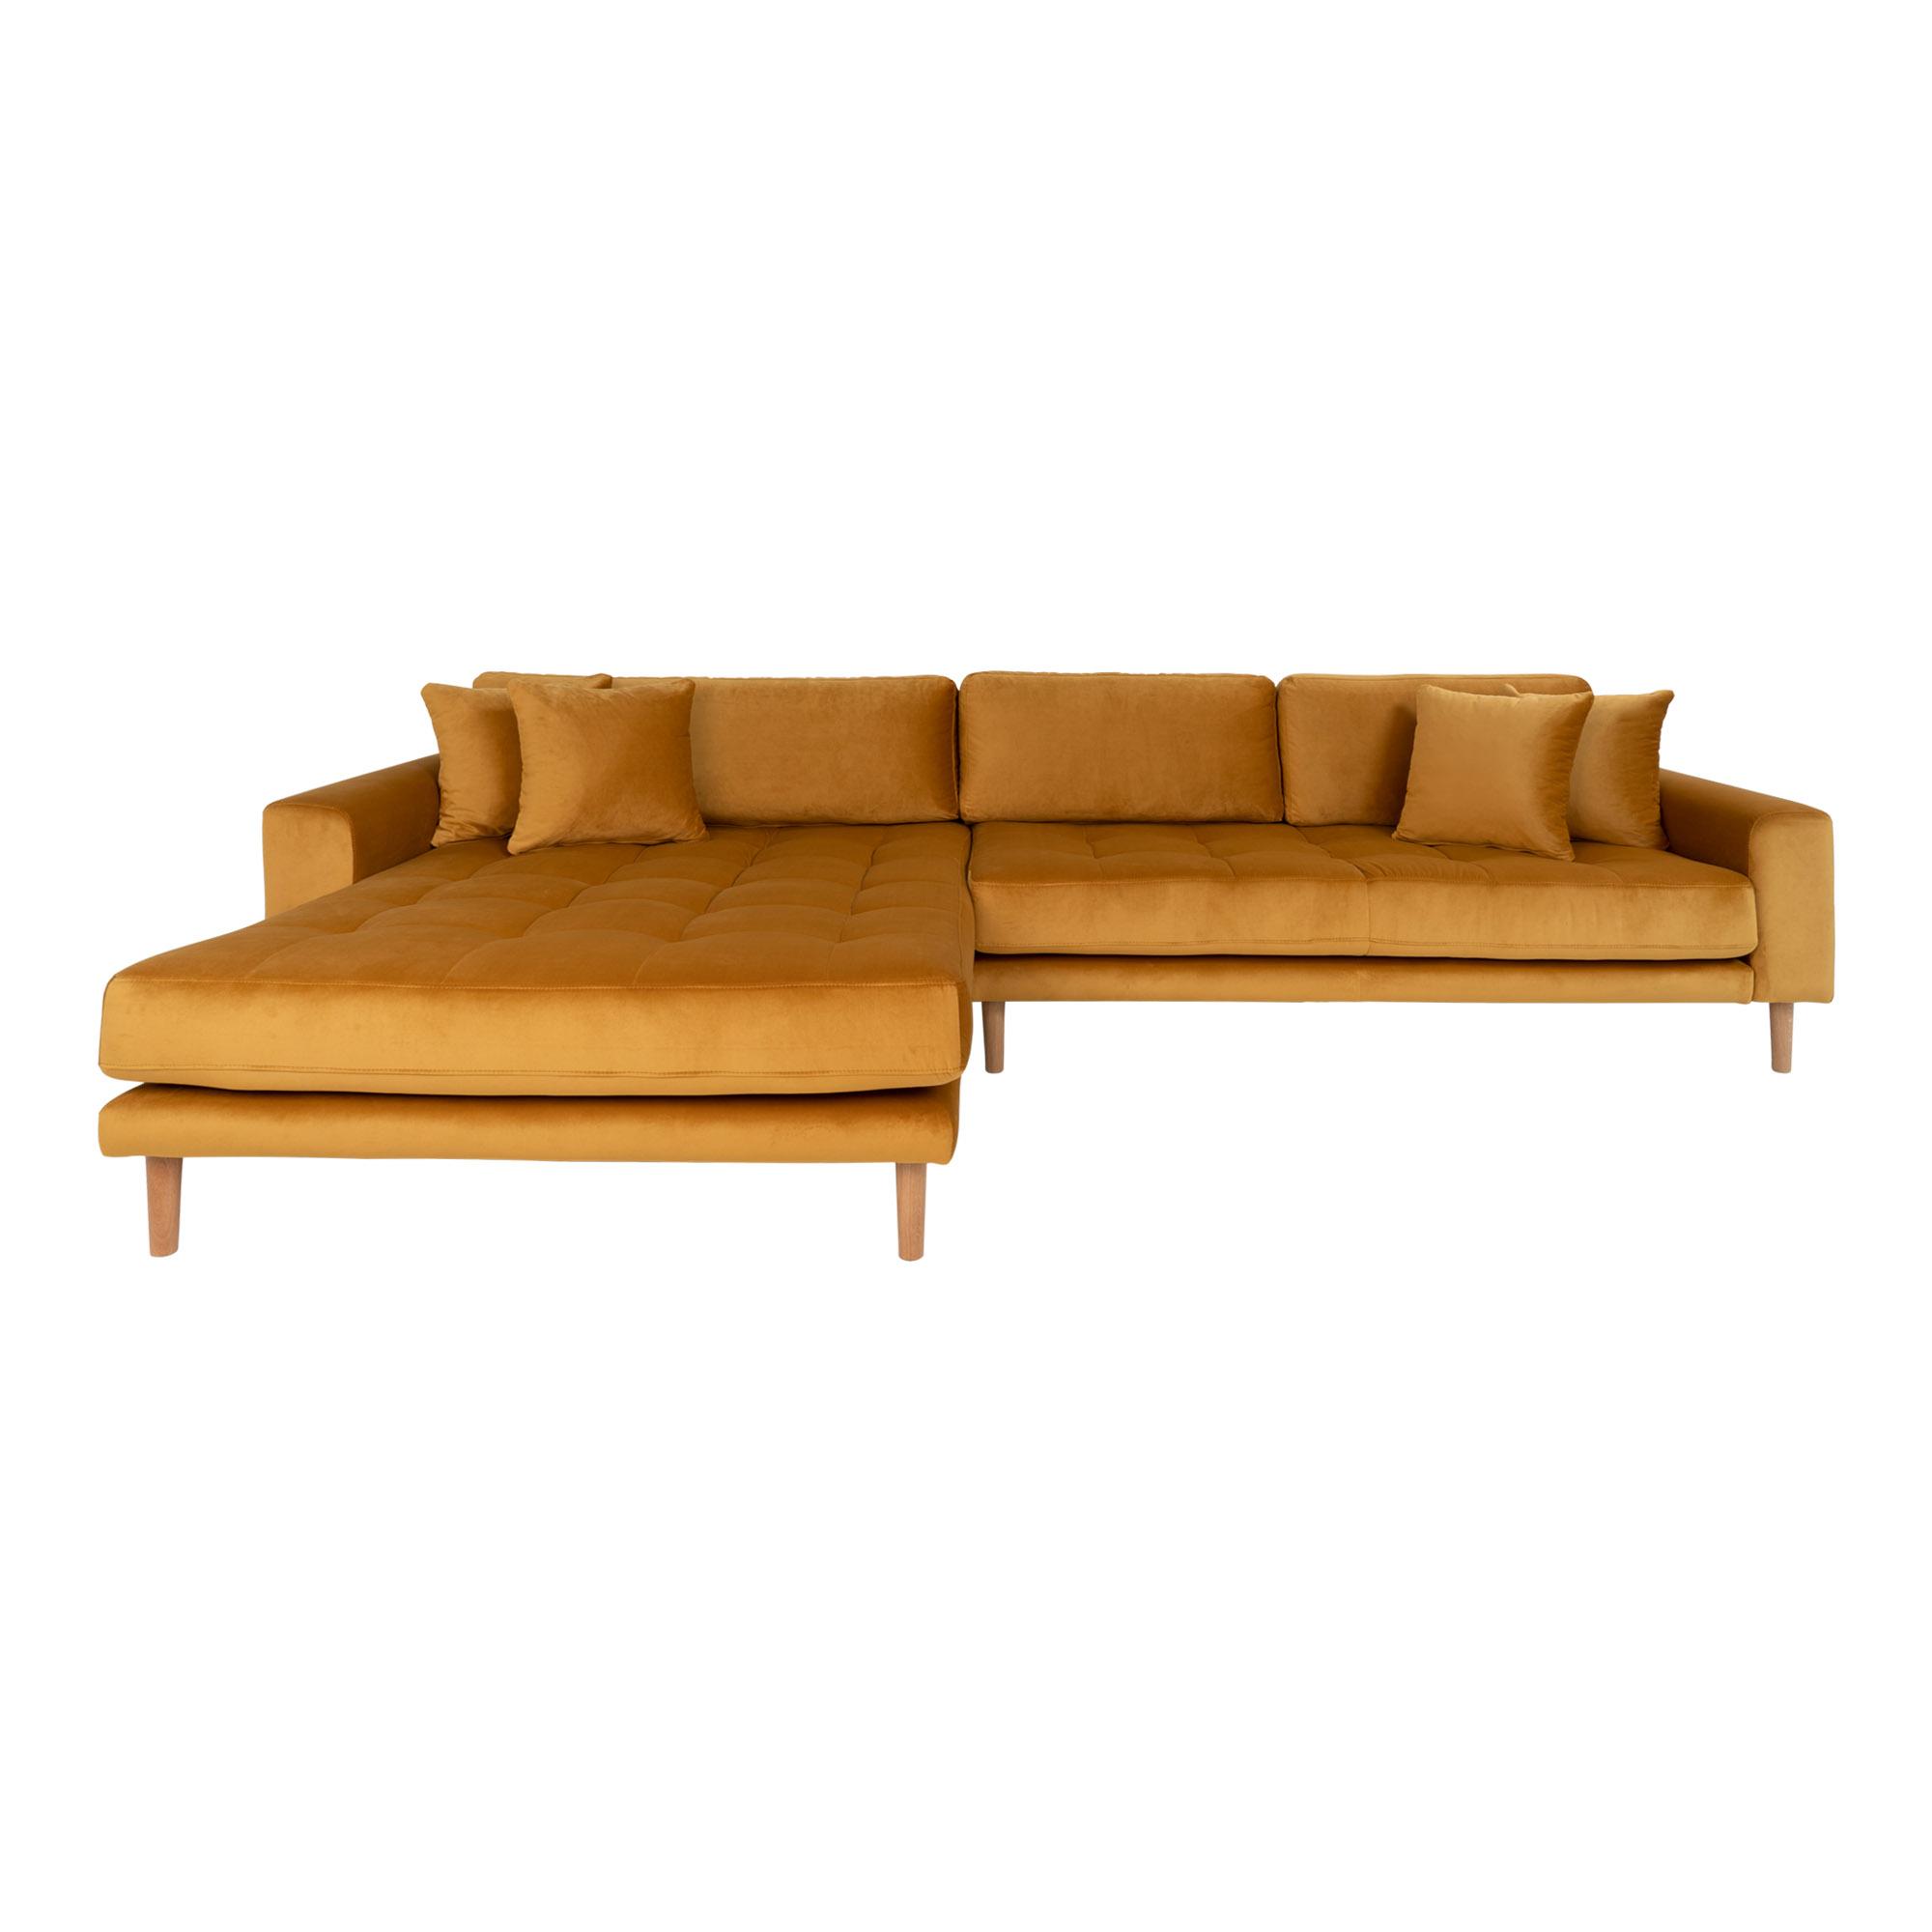 HOUSE NORDIC Lido sofa, m. venstrevendt chaiselong - sennepsgul velour